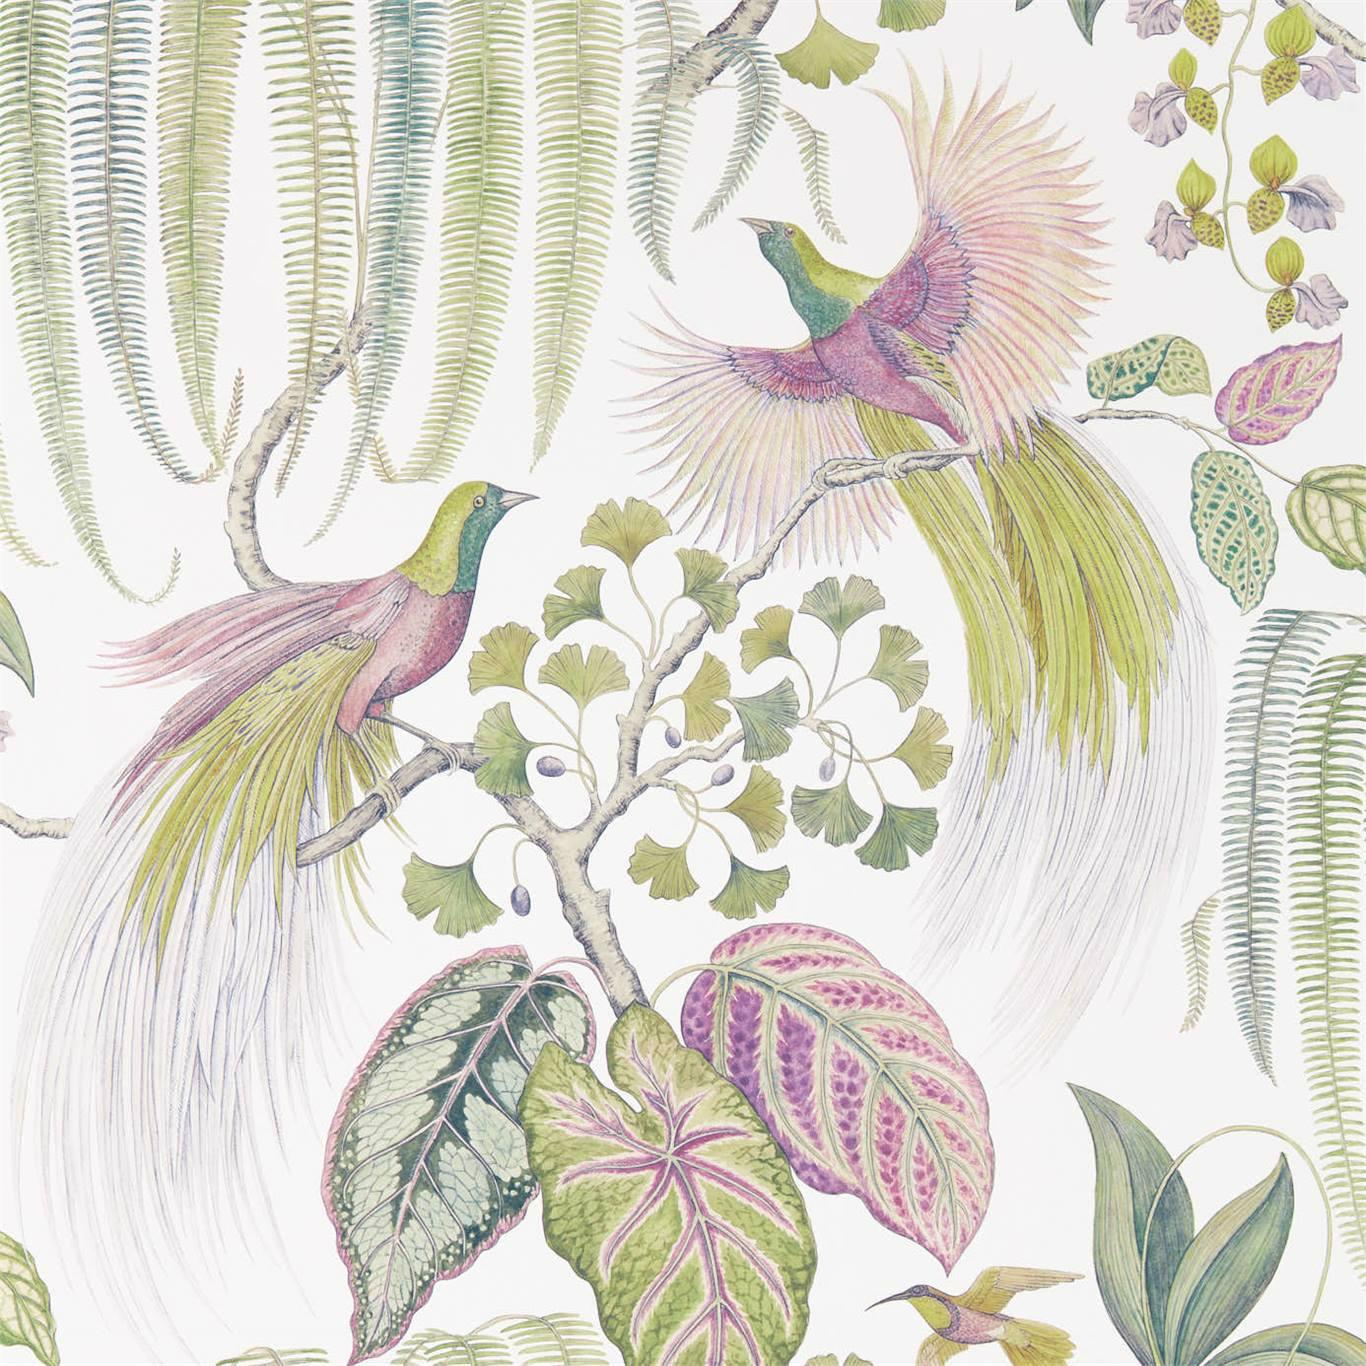 Bird Of Paradise by SAN